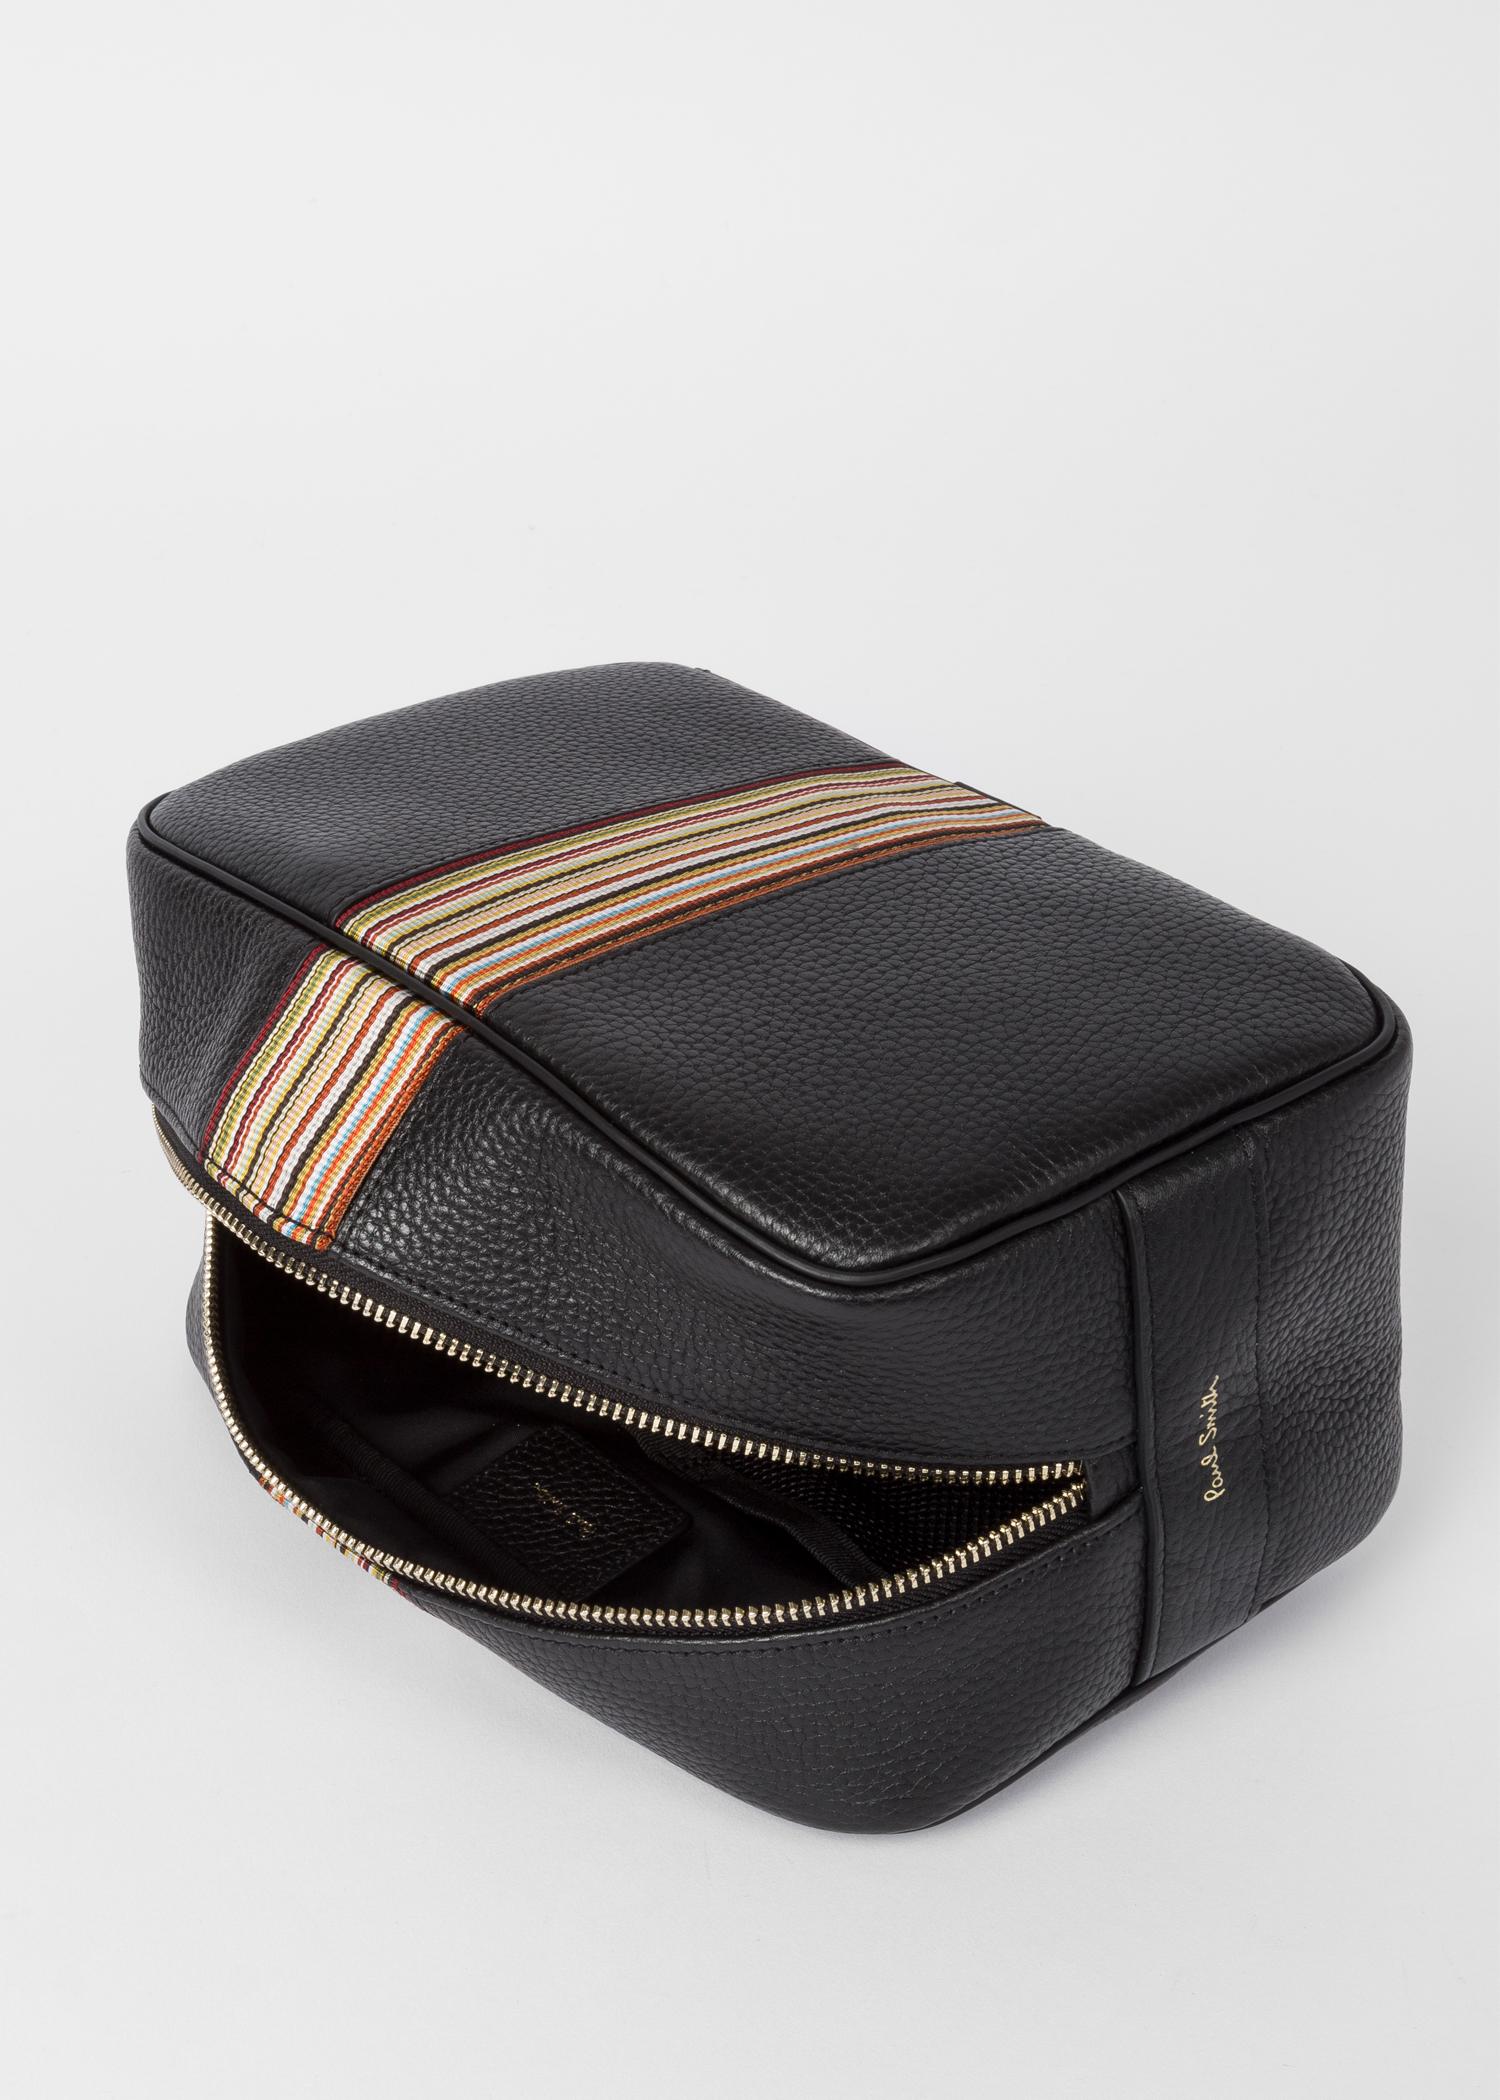 Men s Black Leather Signature Stripe Wash Bag - Paul Smith US afad75869784e